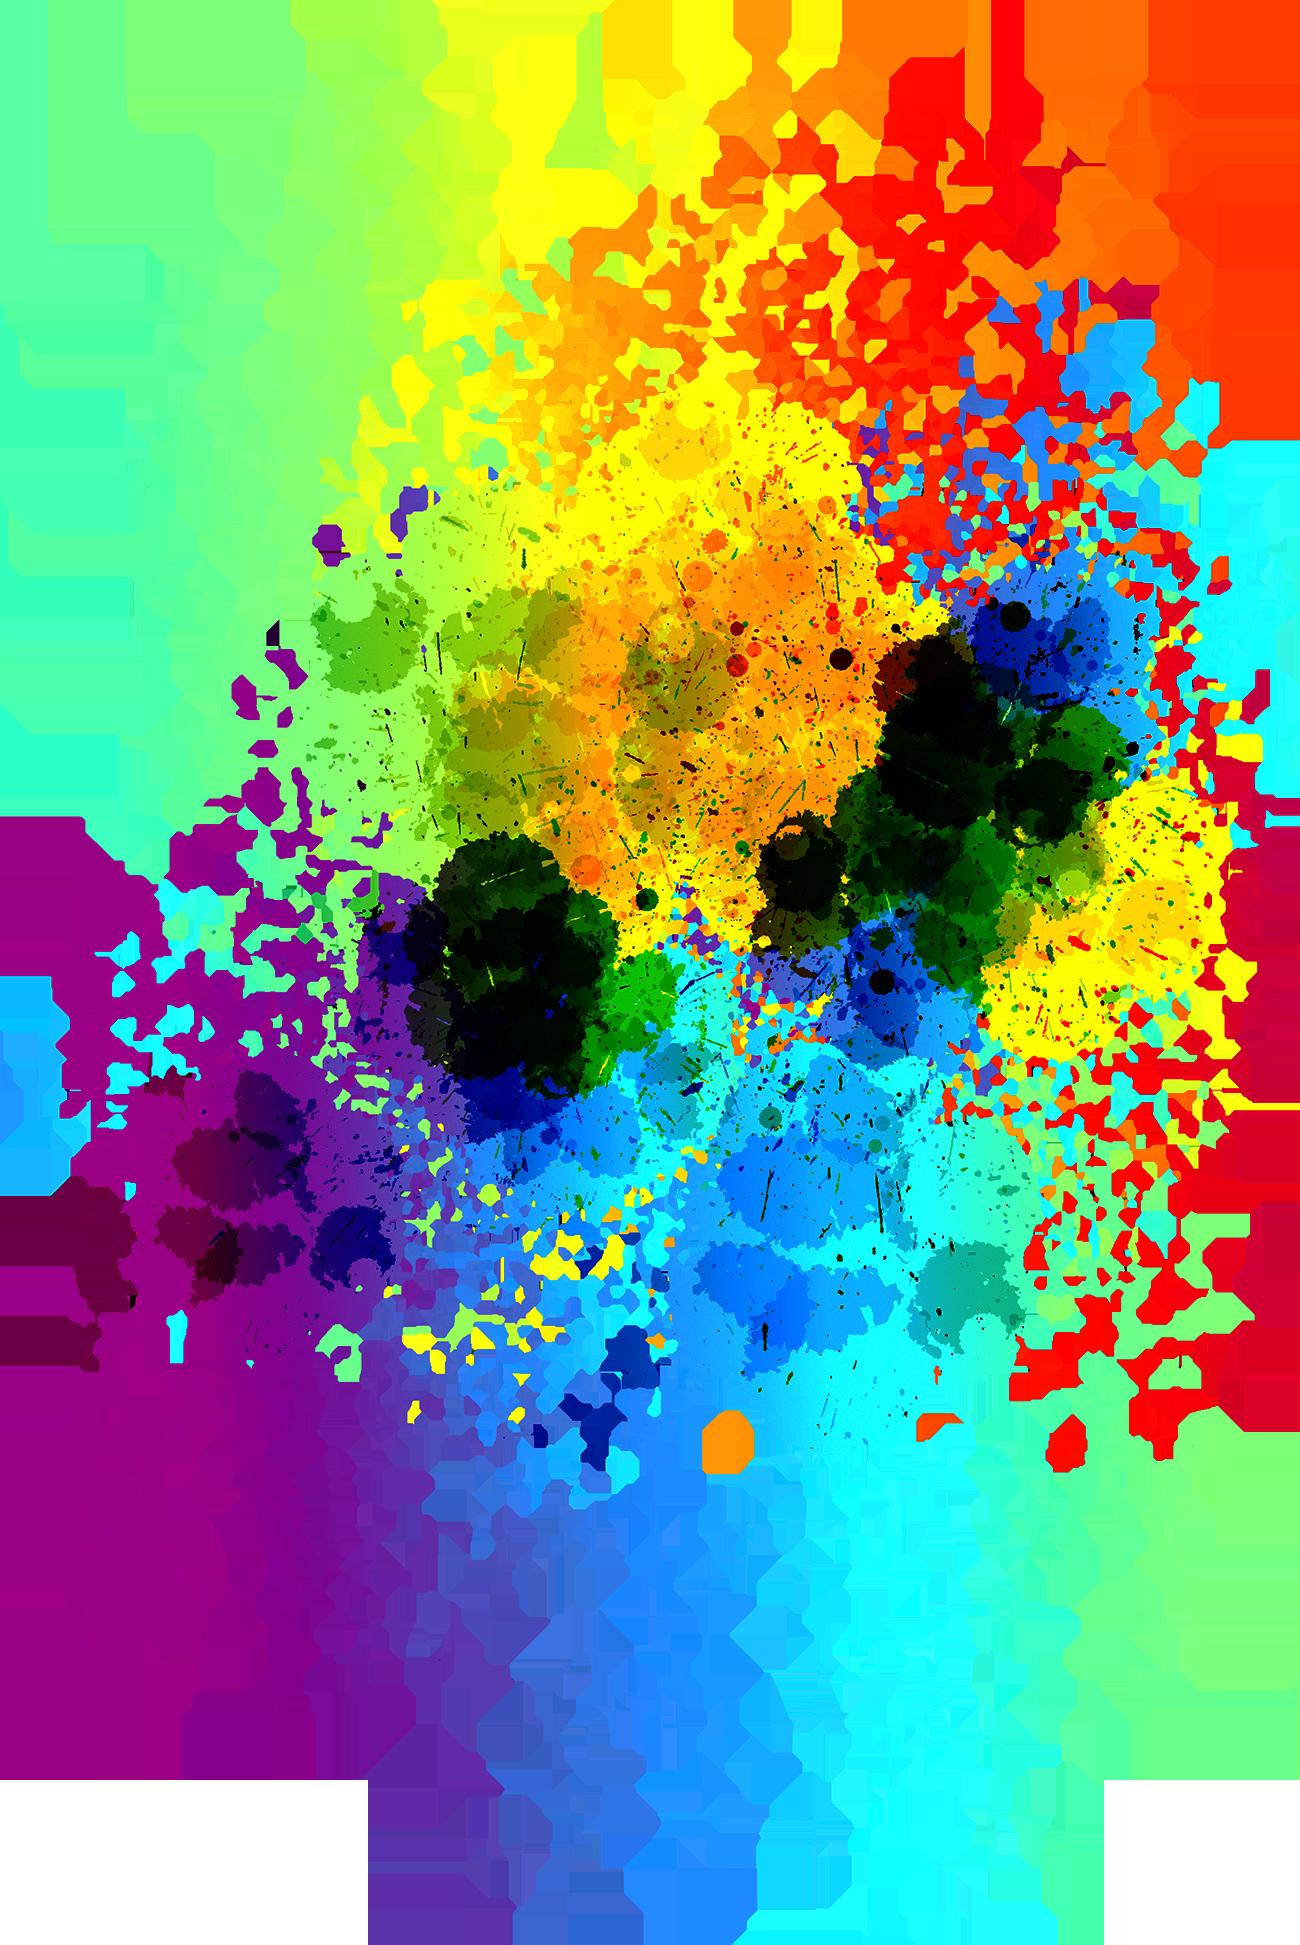 Download Splash Paint Png Splash Ink Png Png Image With No Background Pngkey Com